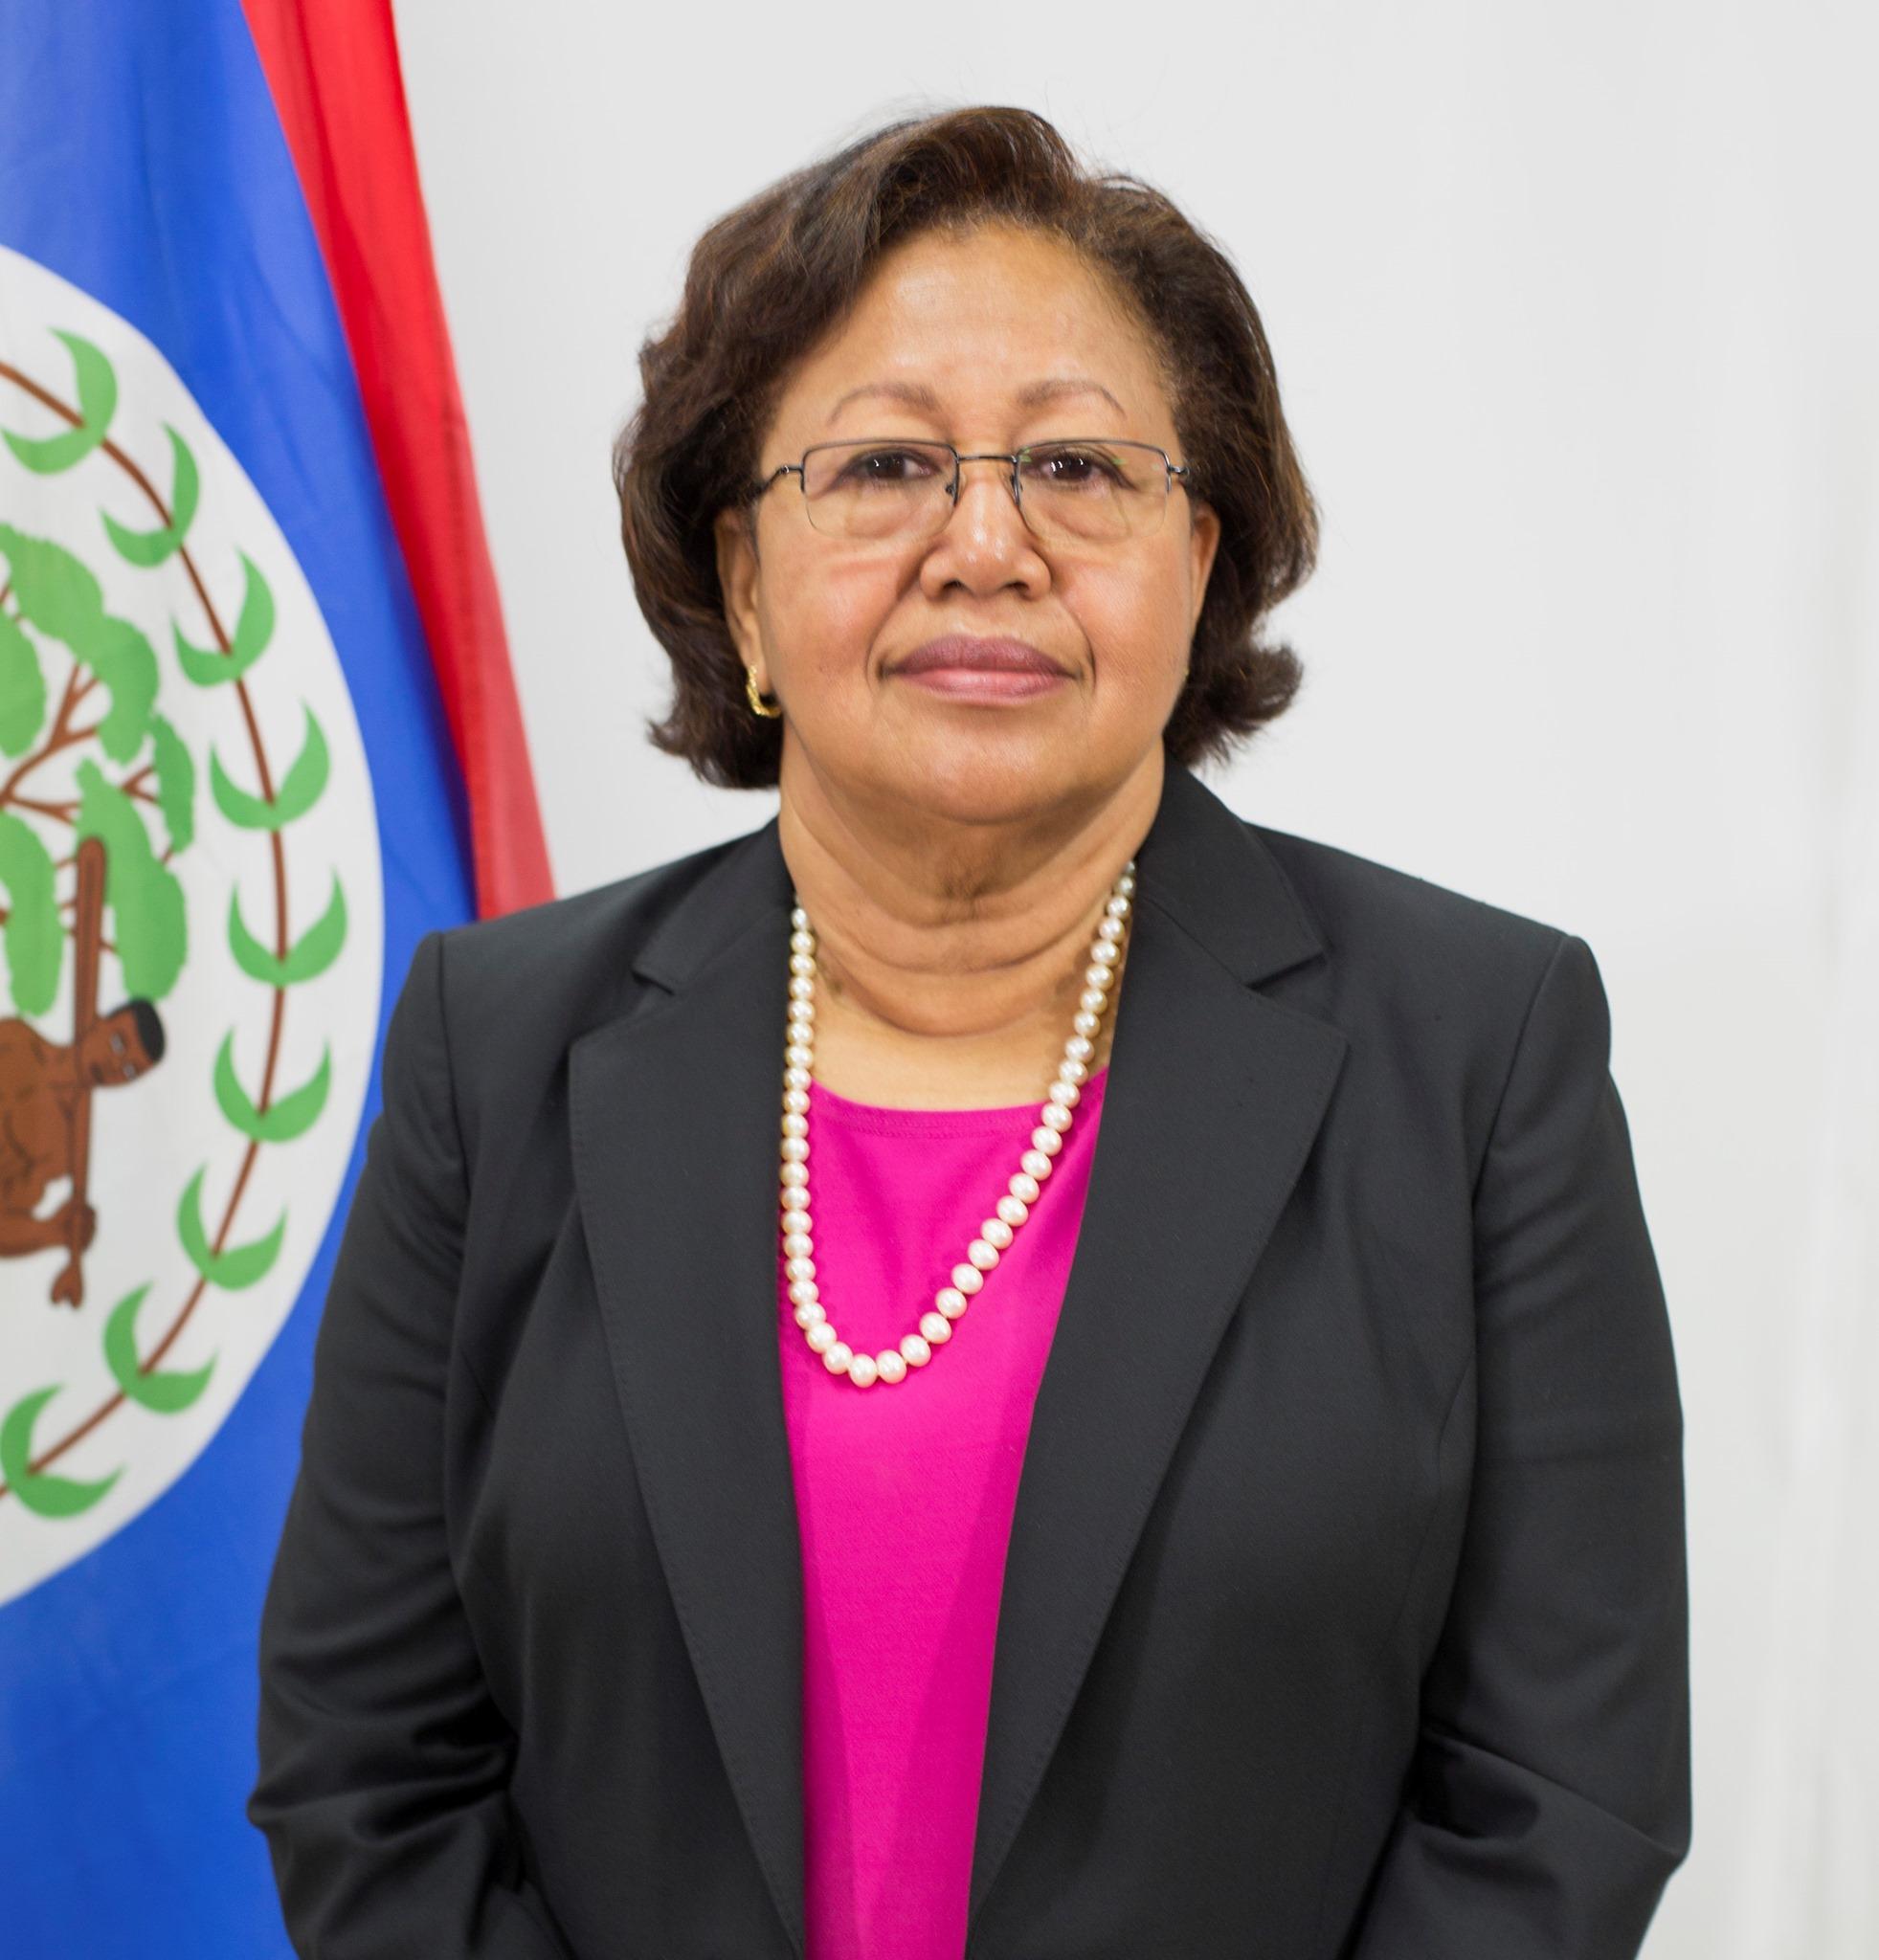 CARICOM Appoints Dr. Carla Barnett as New Secretary General